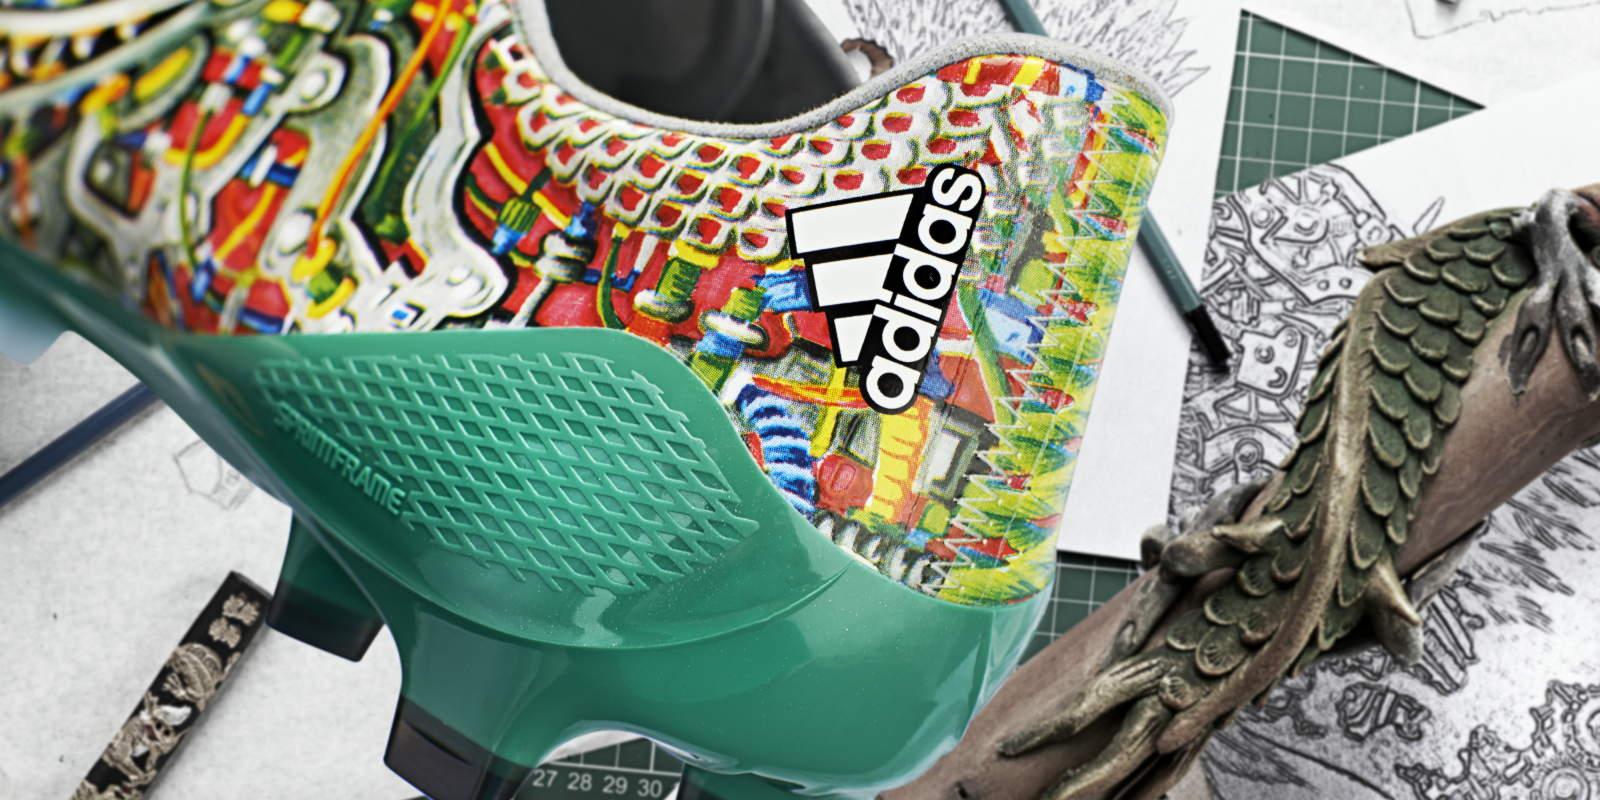 New Adidas Adizero F50 Yamamoto 14 15 Boot Released